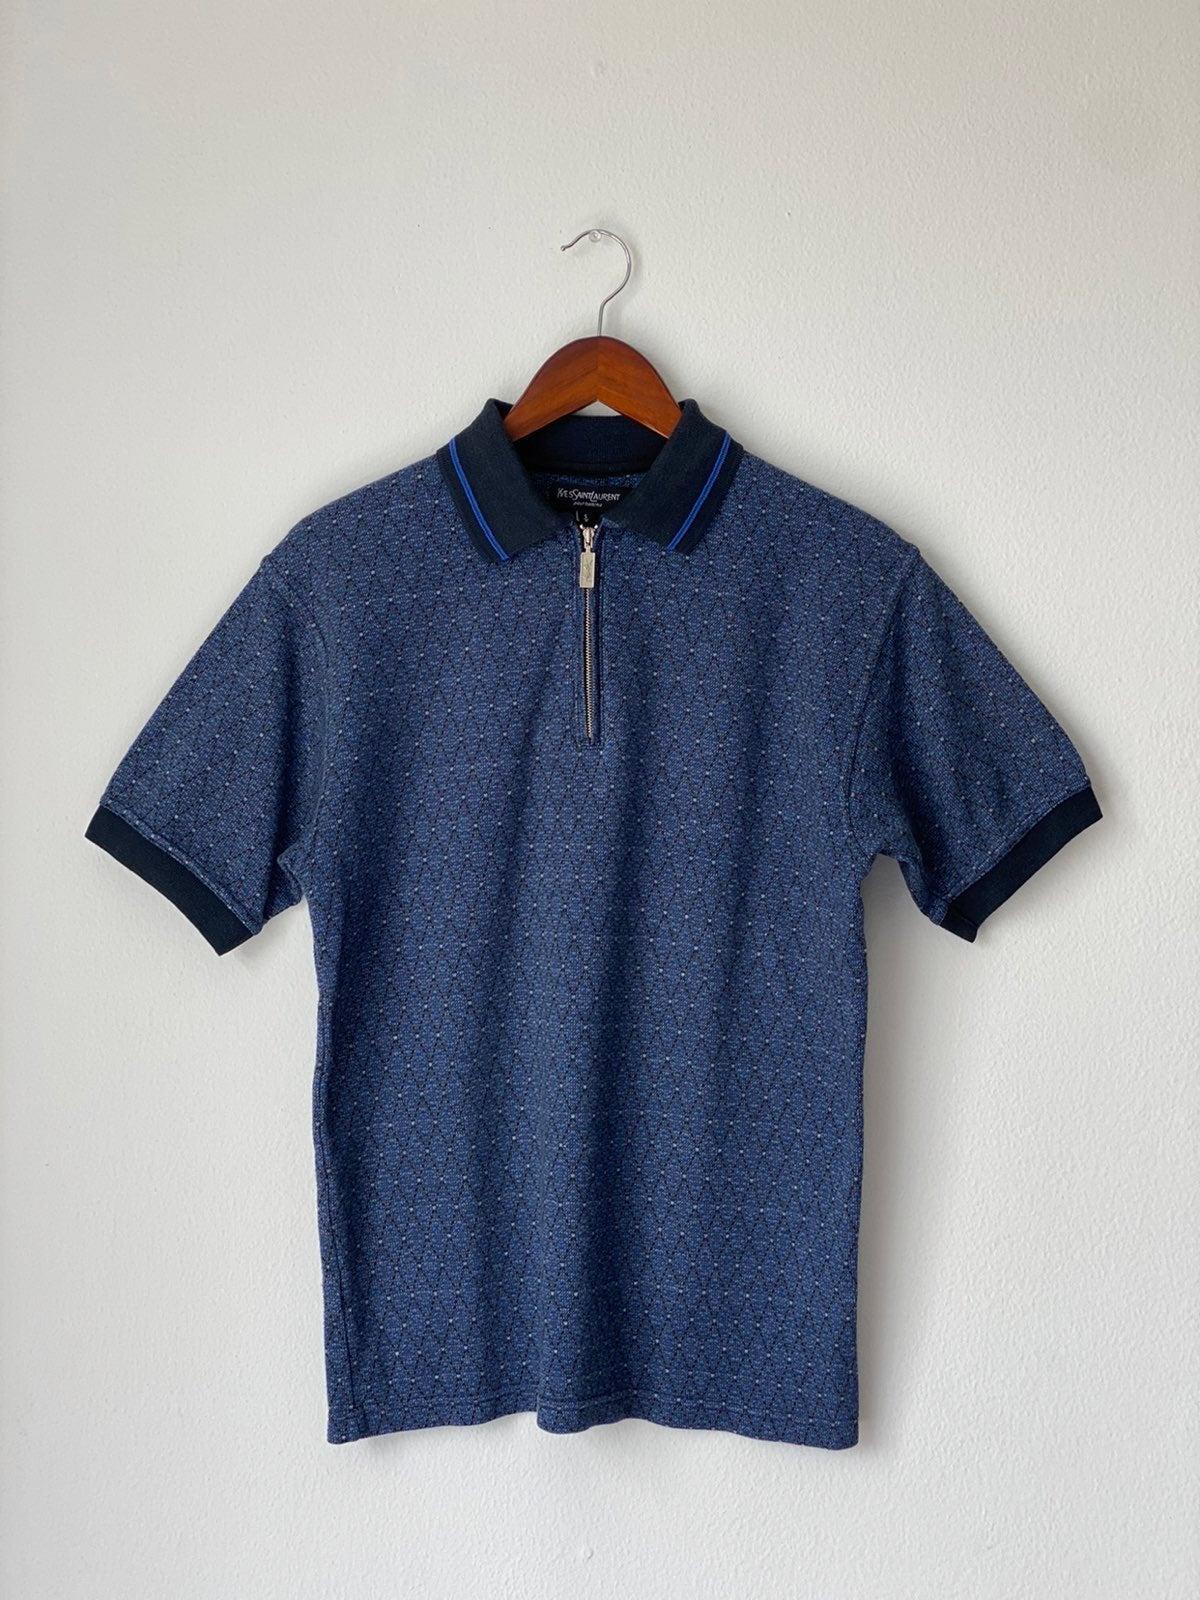 Vintage Yves Saint Laurent Polo Shirt